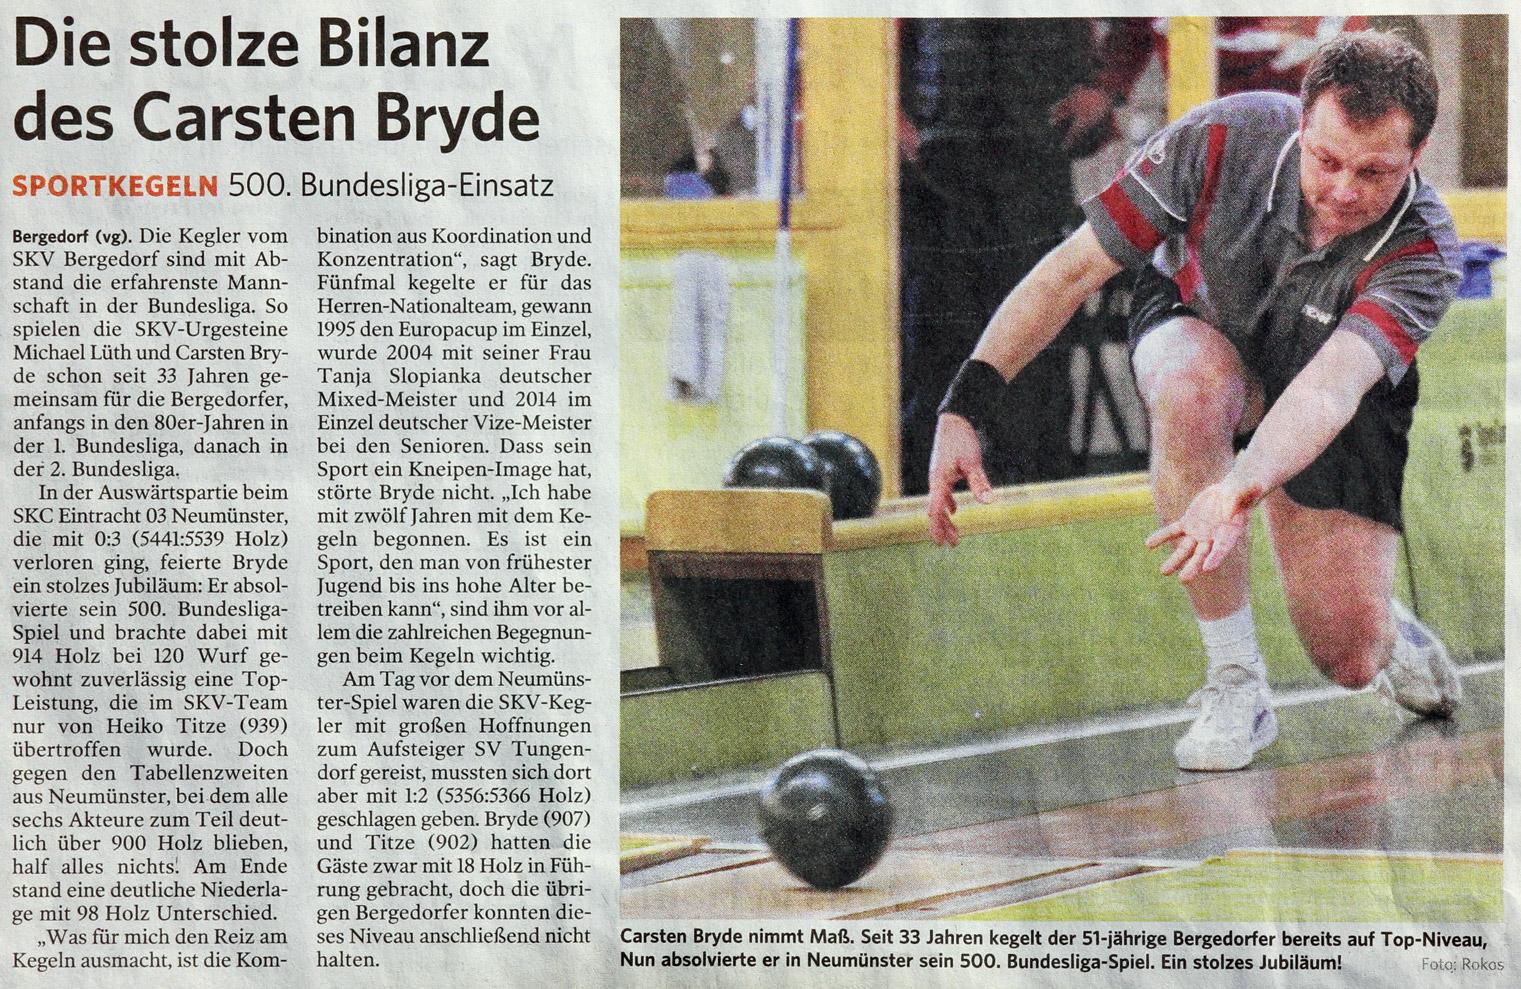 CBryde_500-Bundesligaspiele_20160110b